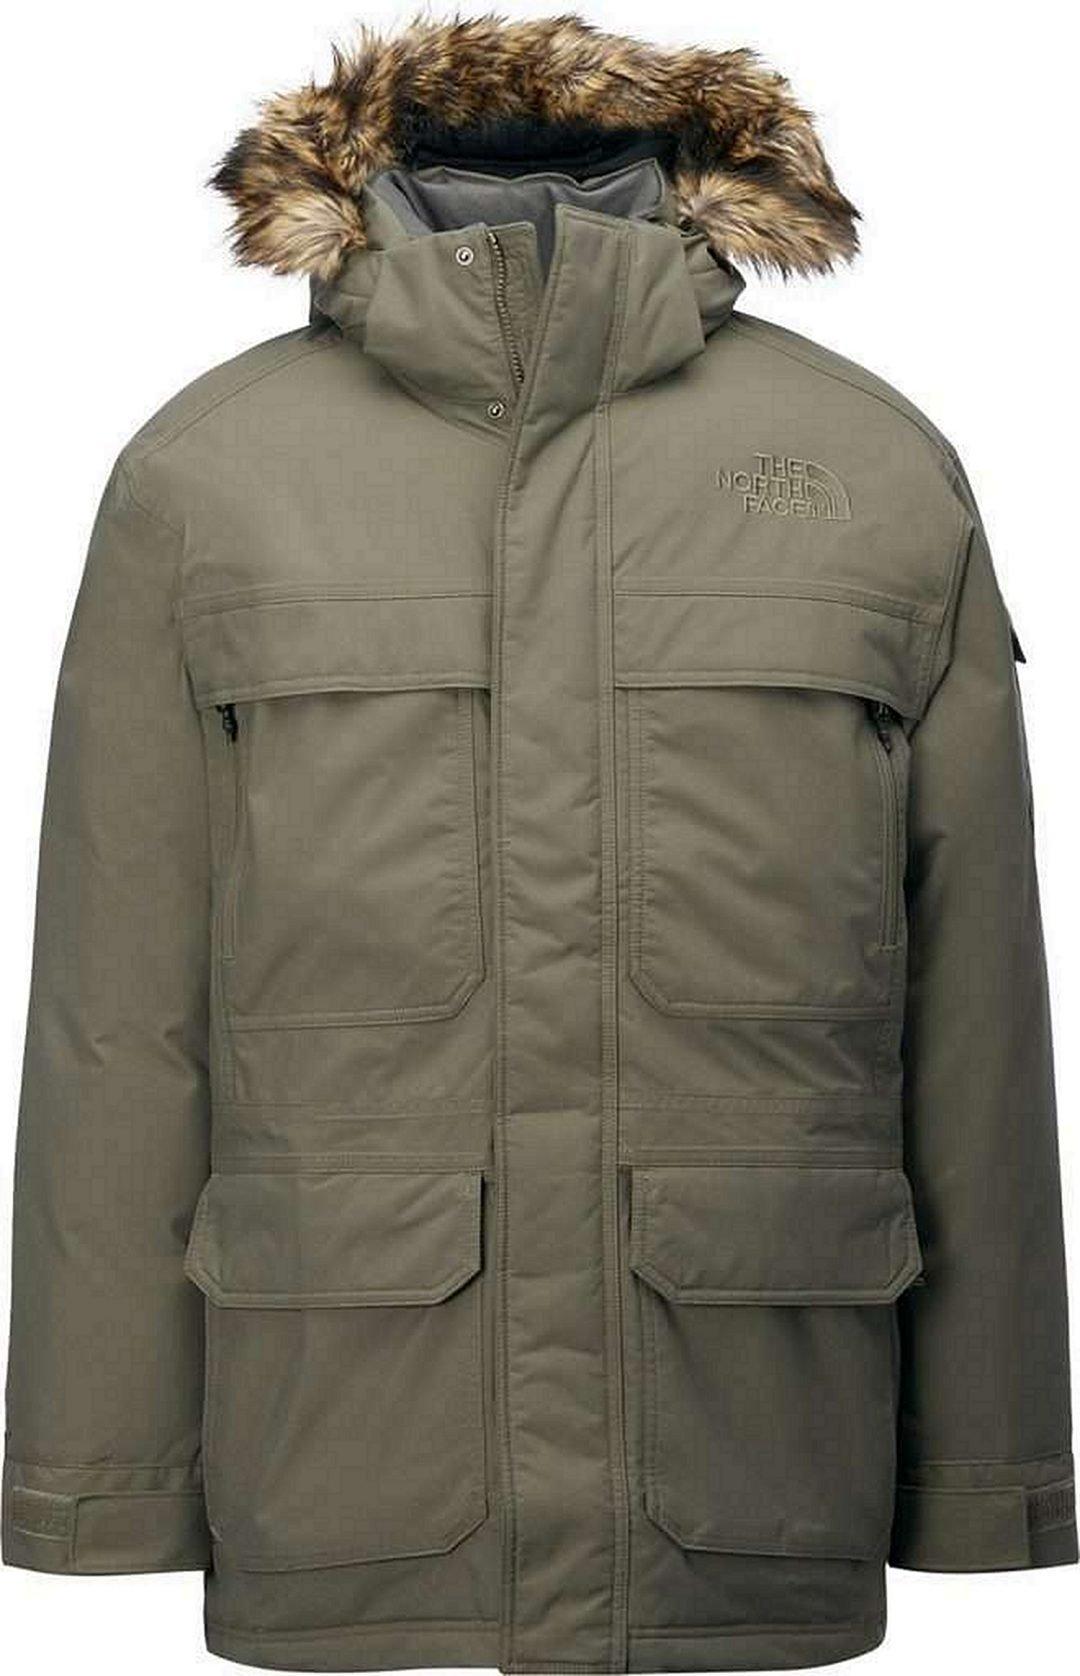 The NorthFace McMurdo Parka III Jacket